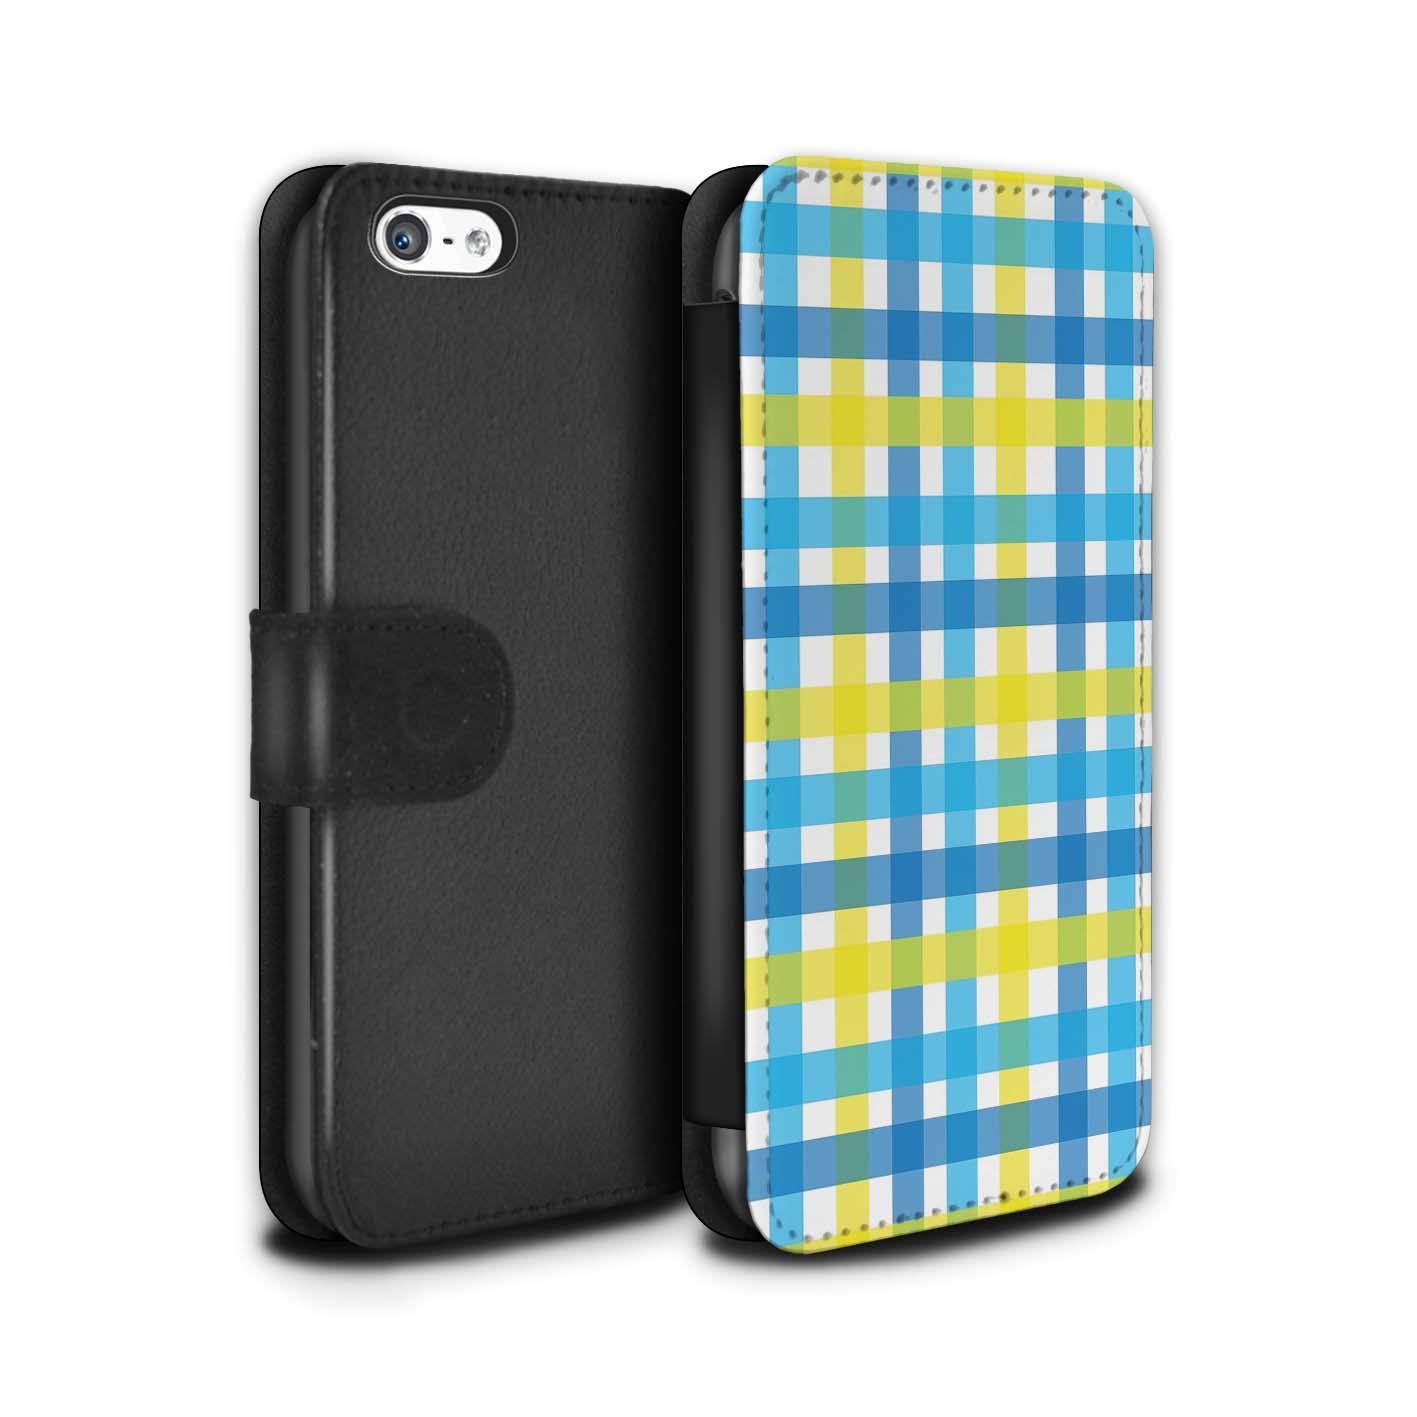 STUFF4-Coque-Etui-Case-Cuir-PU-pour-Apple-iPhone-5C-Mode-Jaune